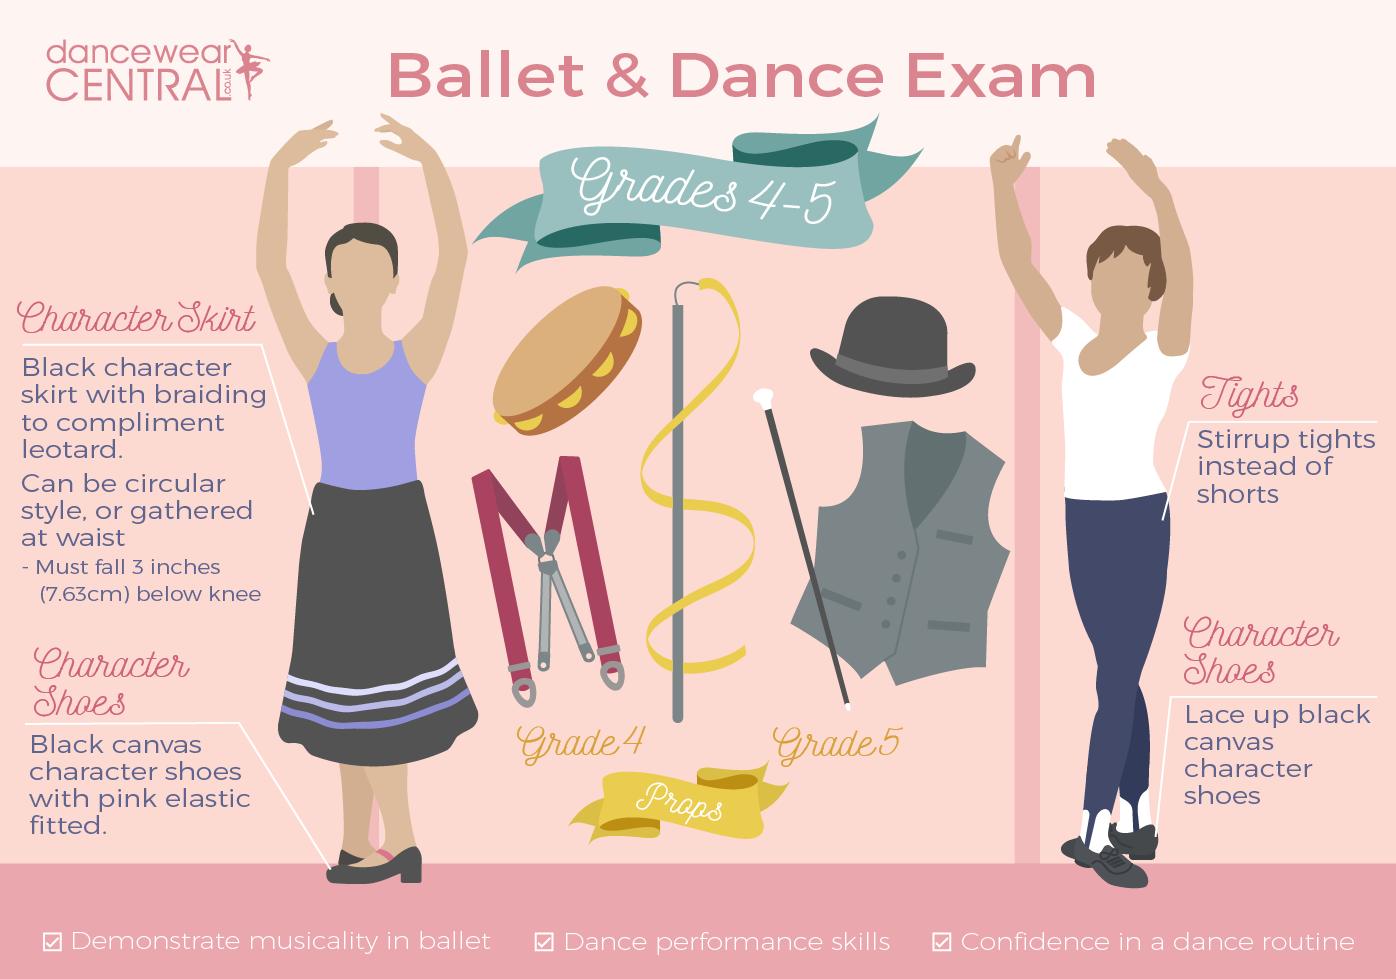 Grade 4 - 5 Ballet Dance Exam Uniform